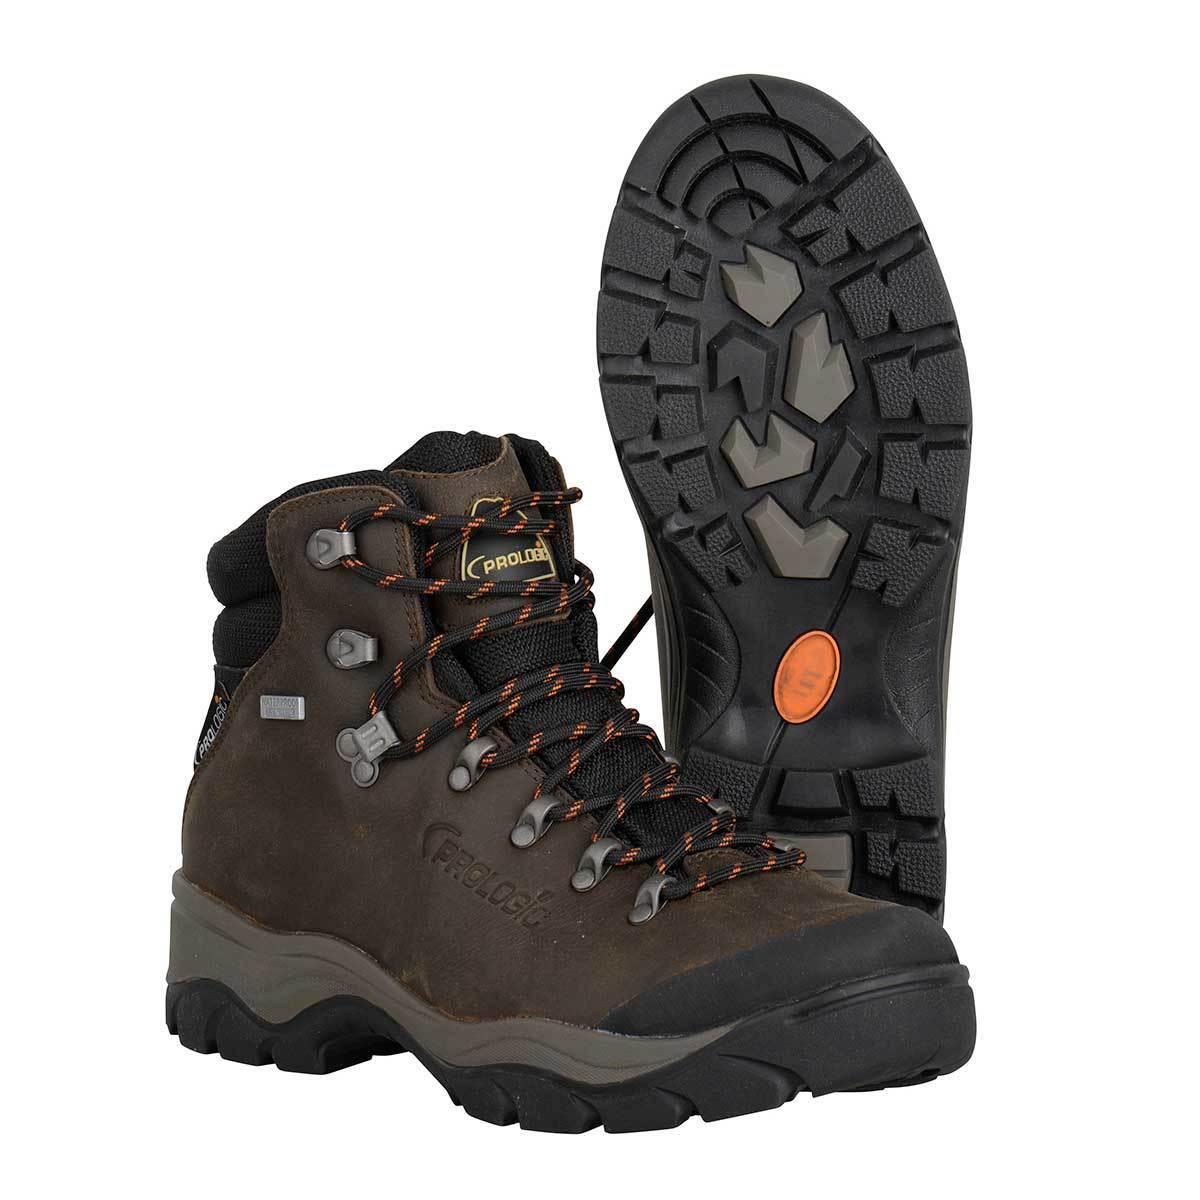 Prologic Kiruna Leather Carp Fishing Boots 100% Waterproof Breathable RRP .99